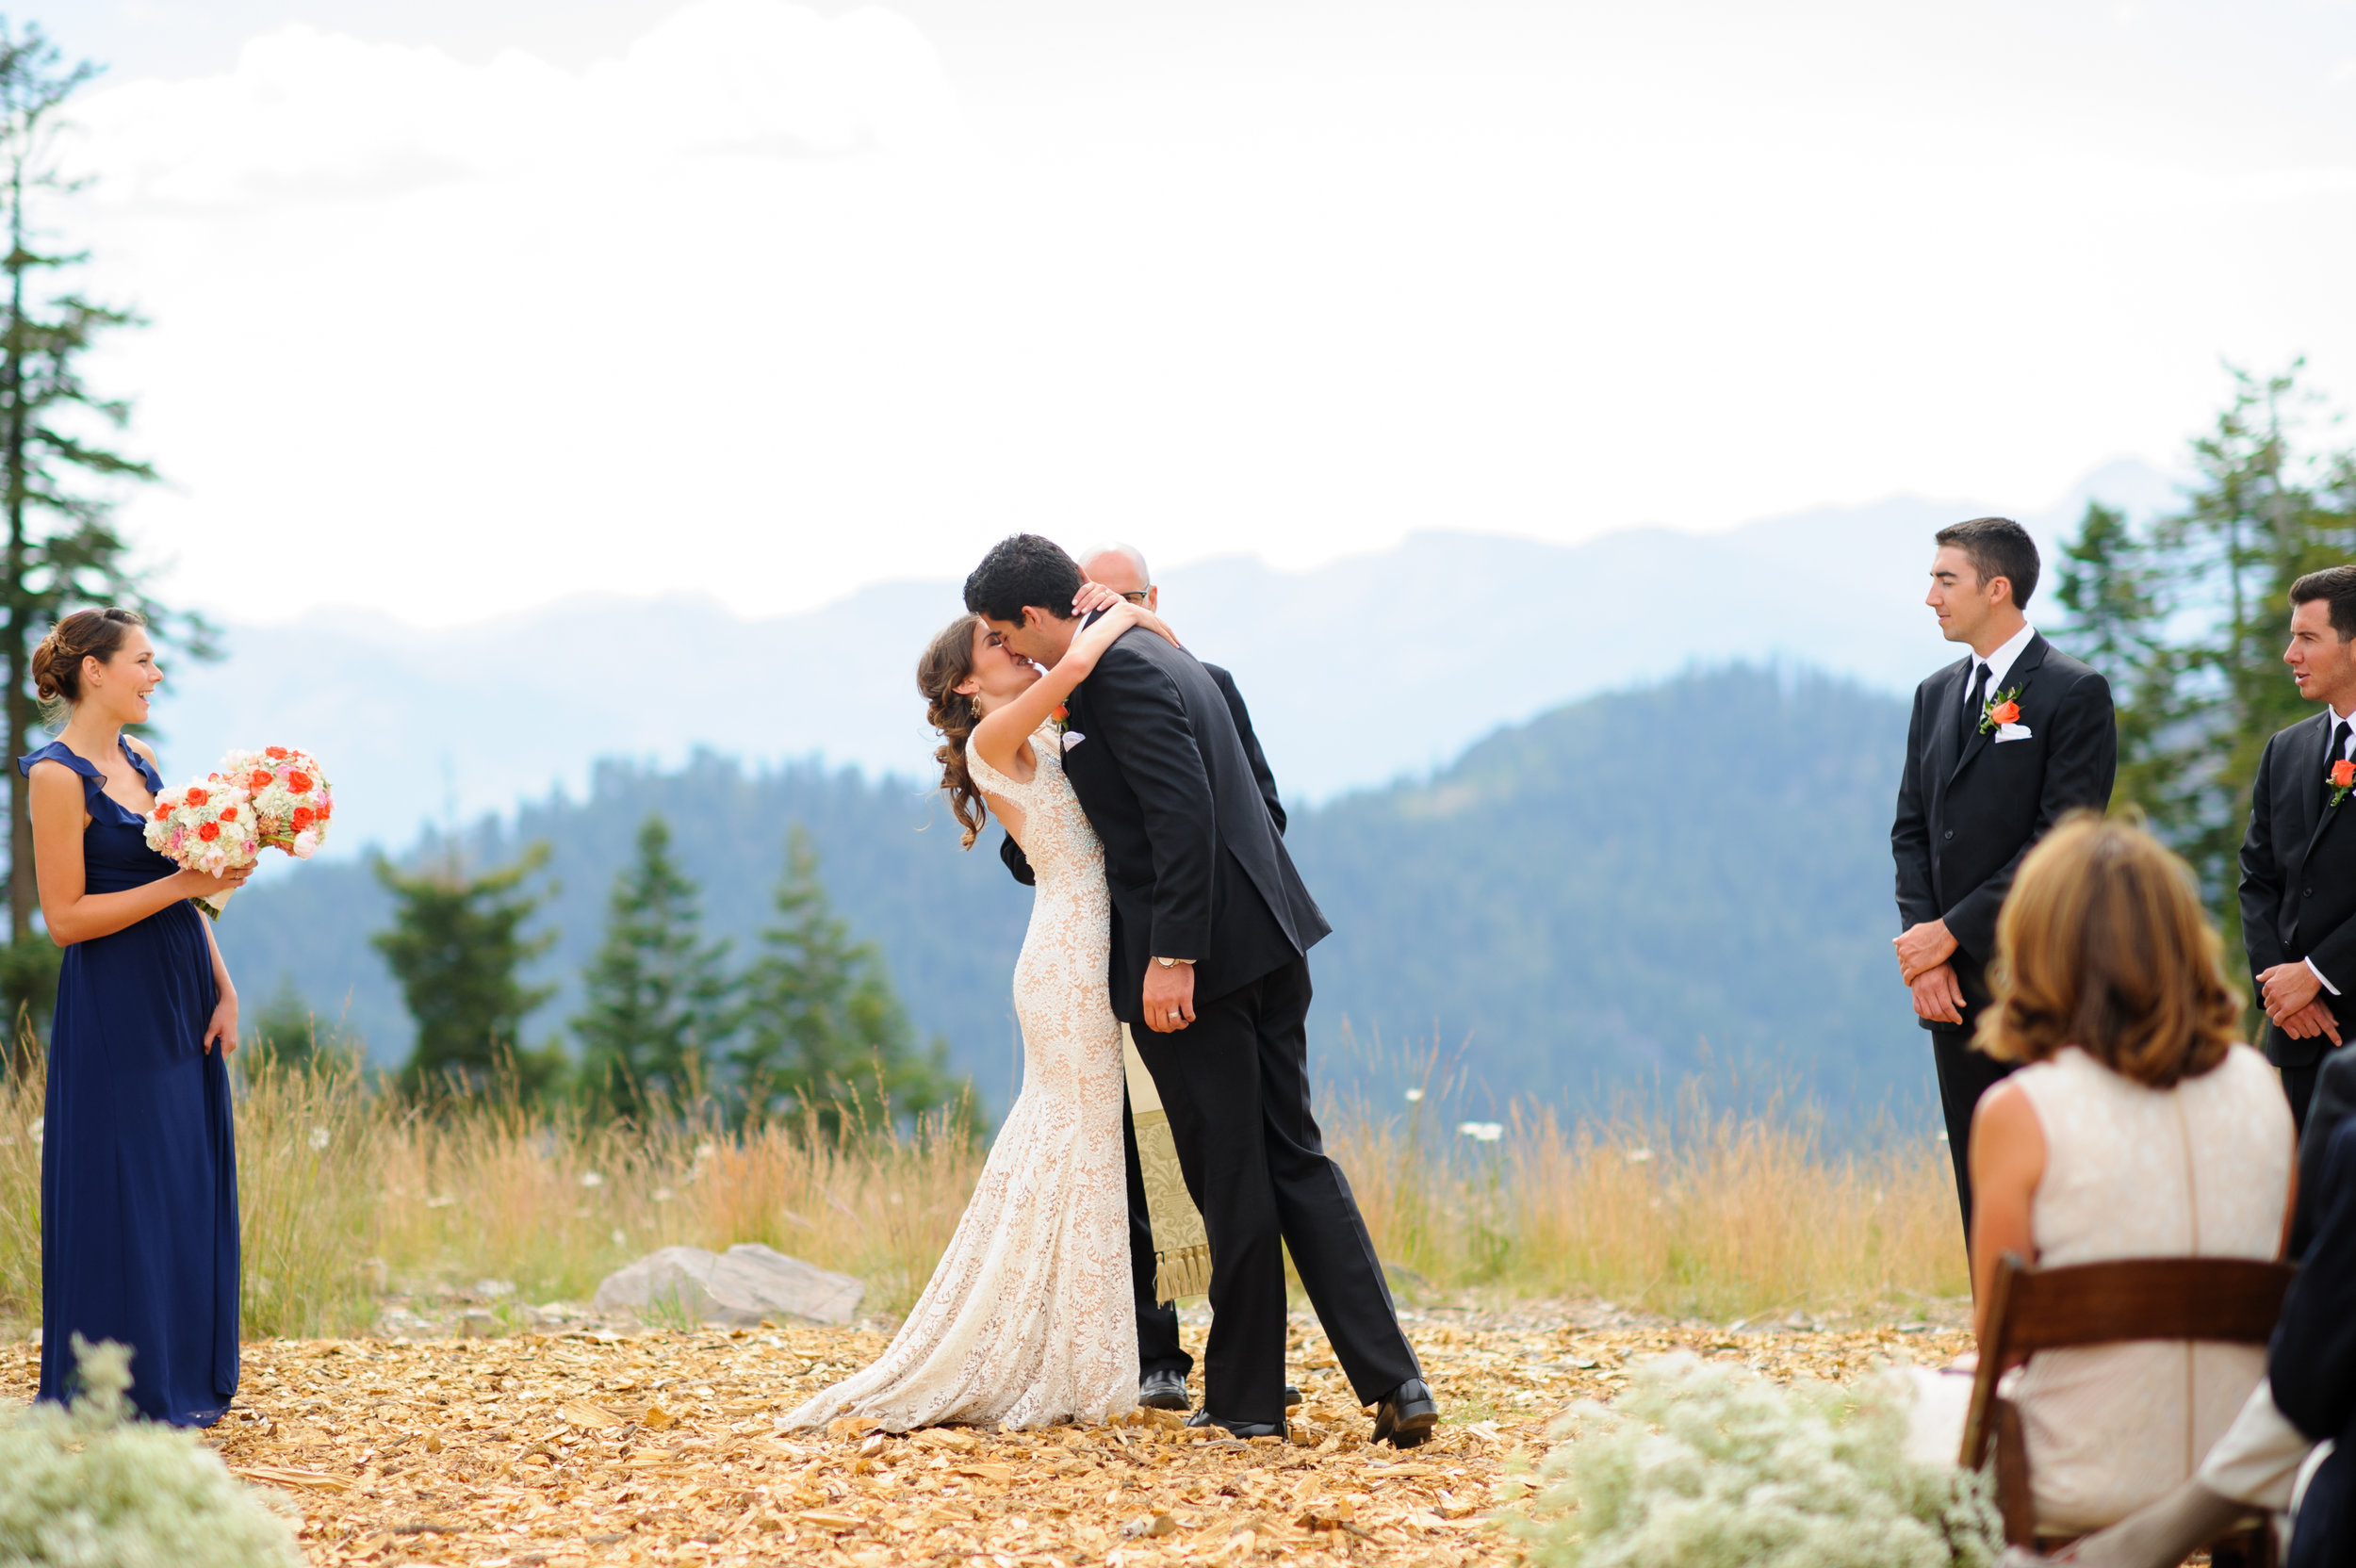 katie-myles-024-northstar-resort-tahoe-wedding-photographer-katherine-nicole-photography.JPG